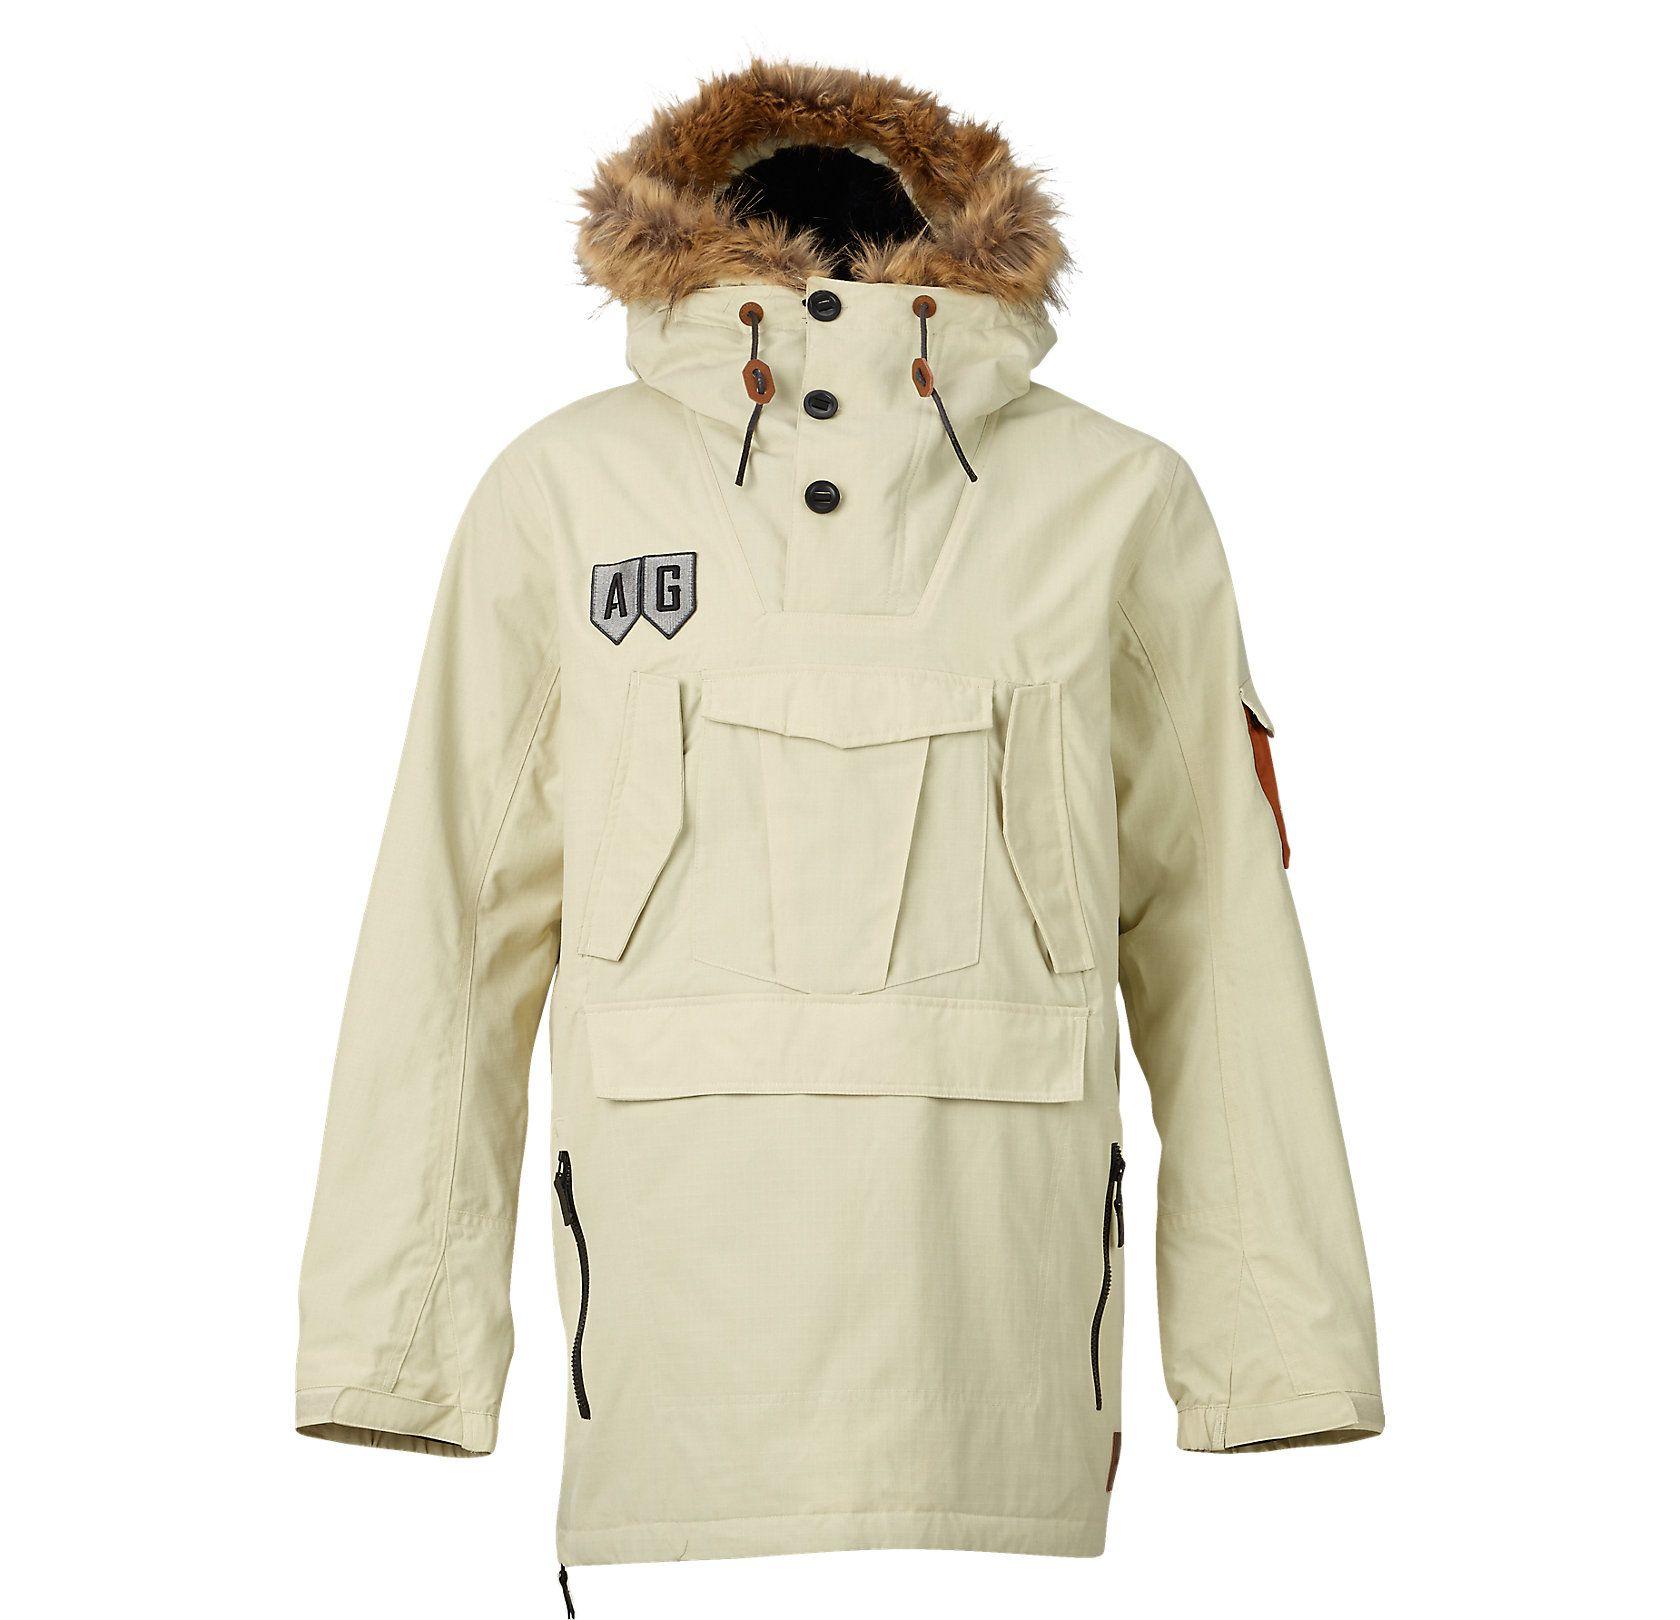 Mens snowboard jacket with fur hood